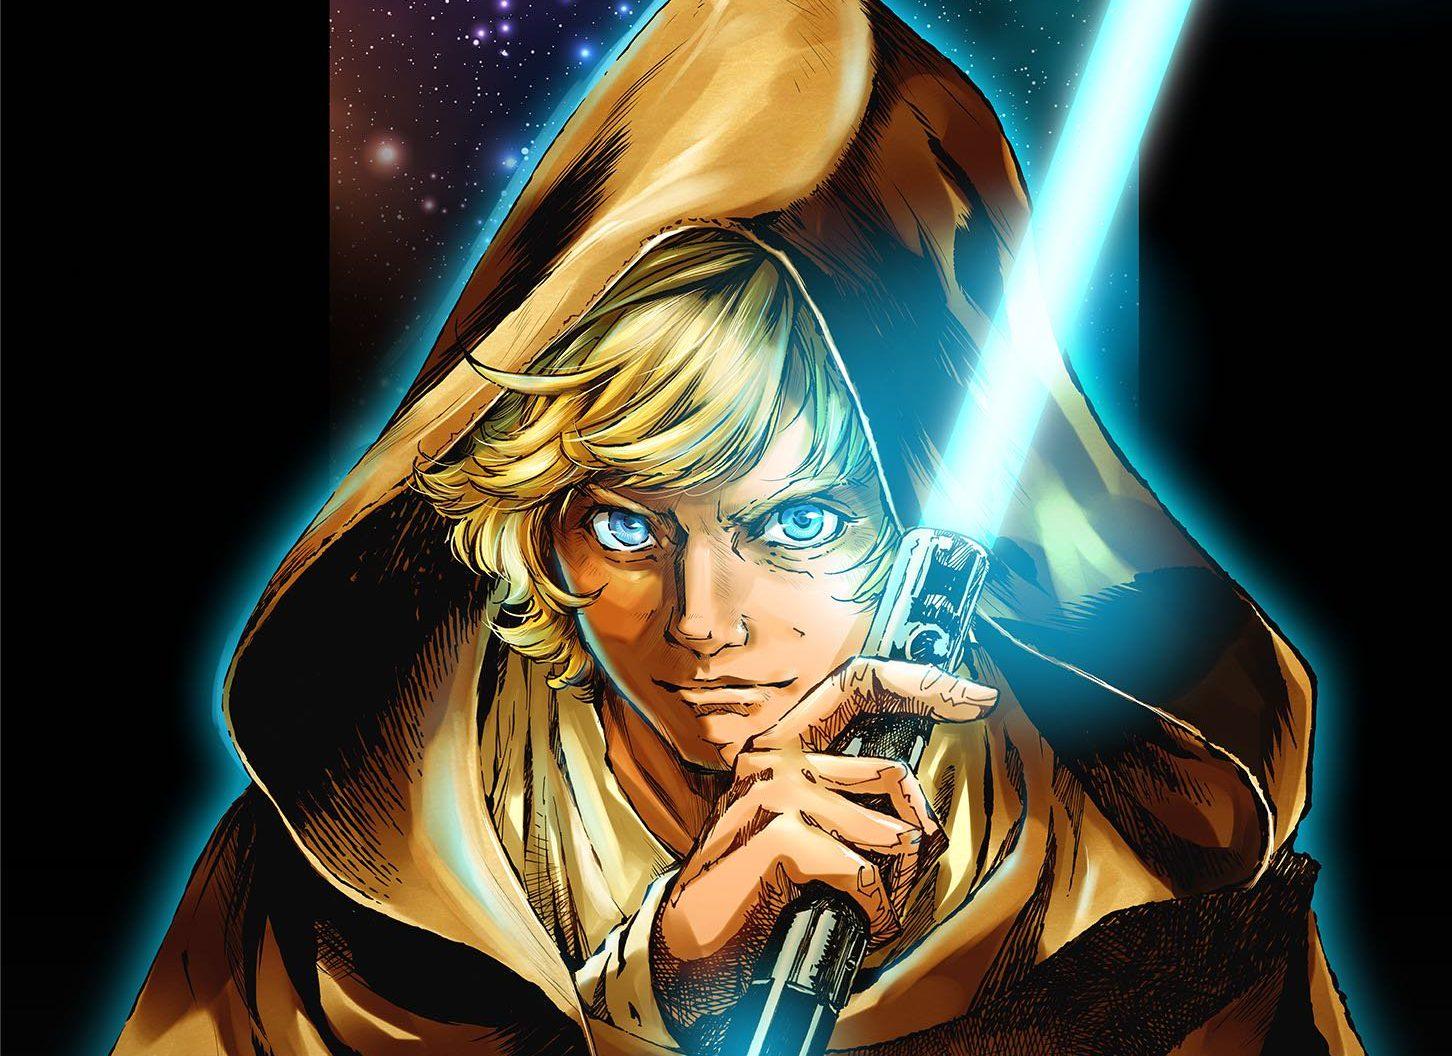 Star Wars: in arrivo un manga su Luke Skywalker thumbnail